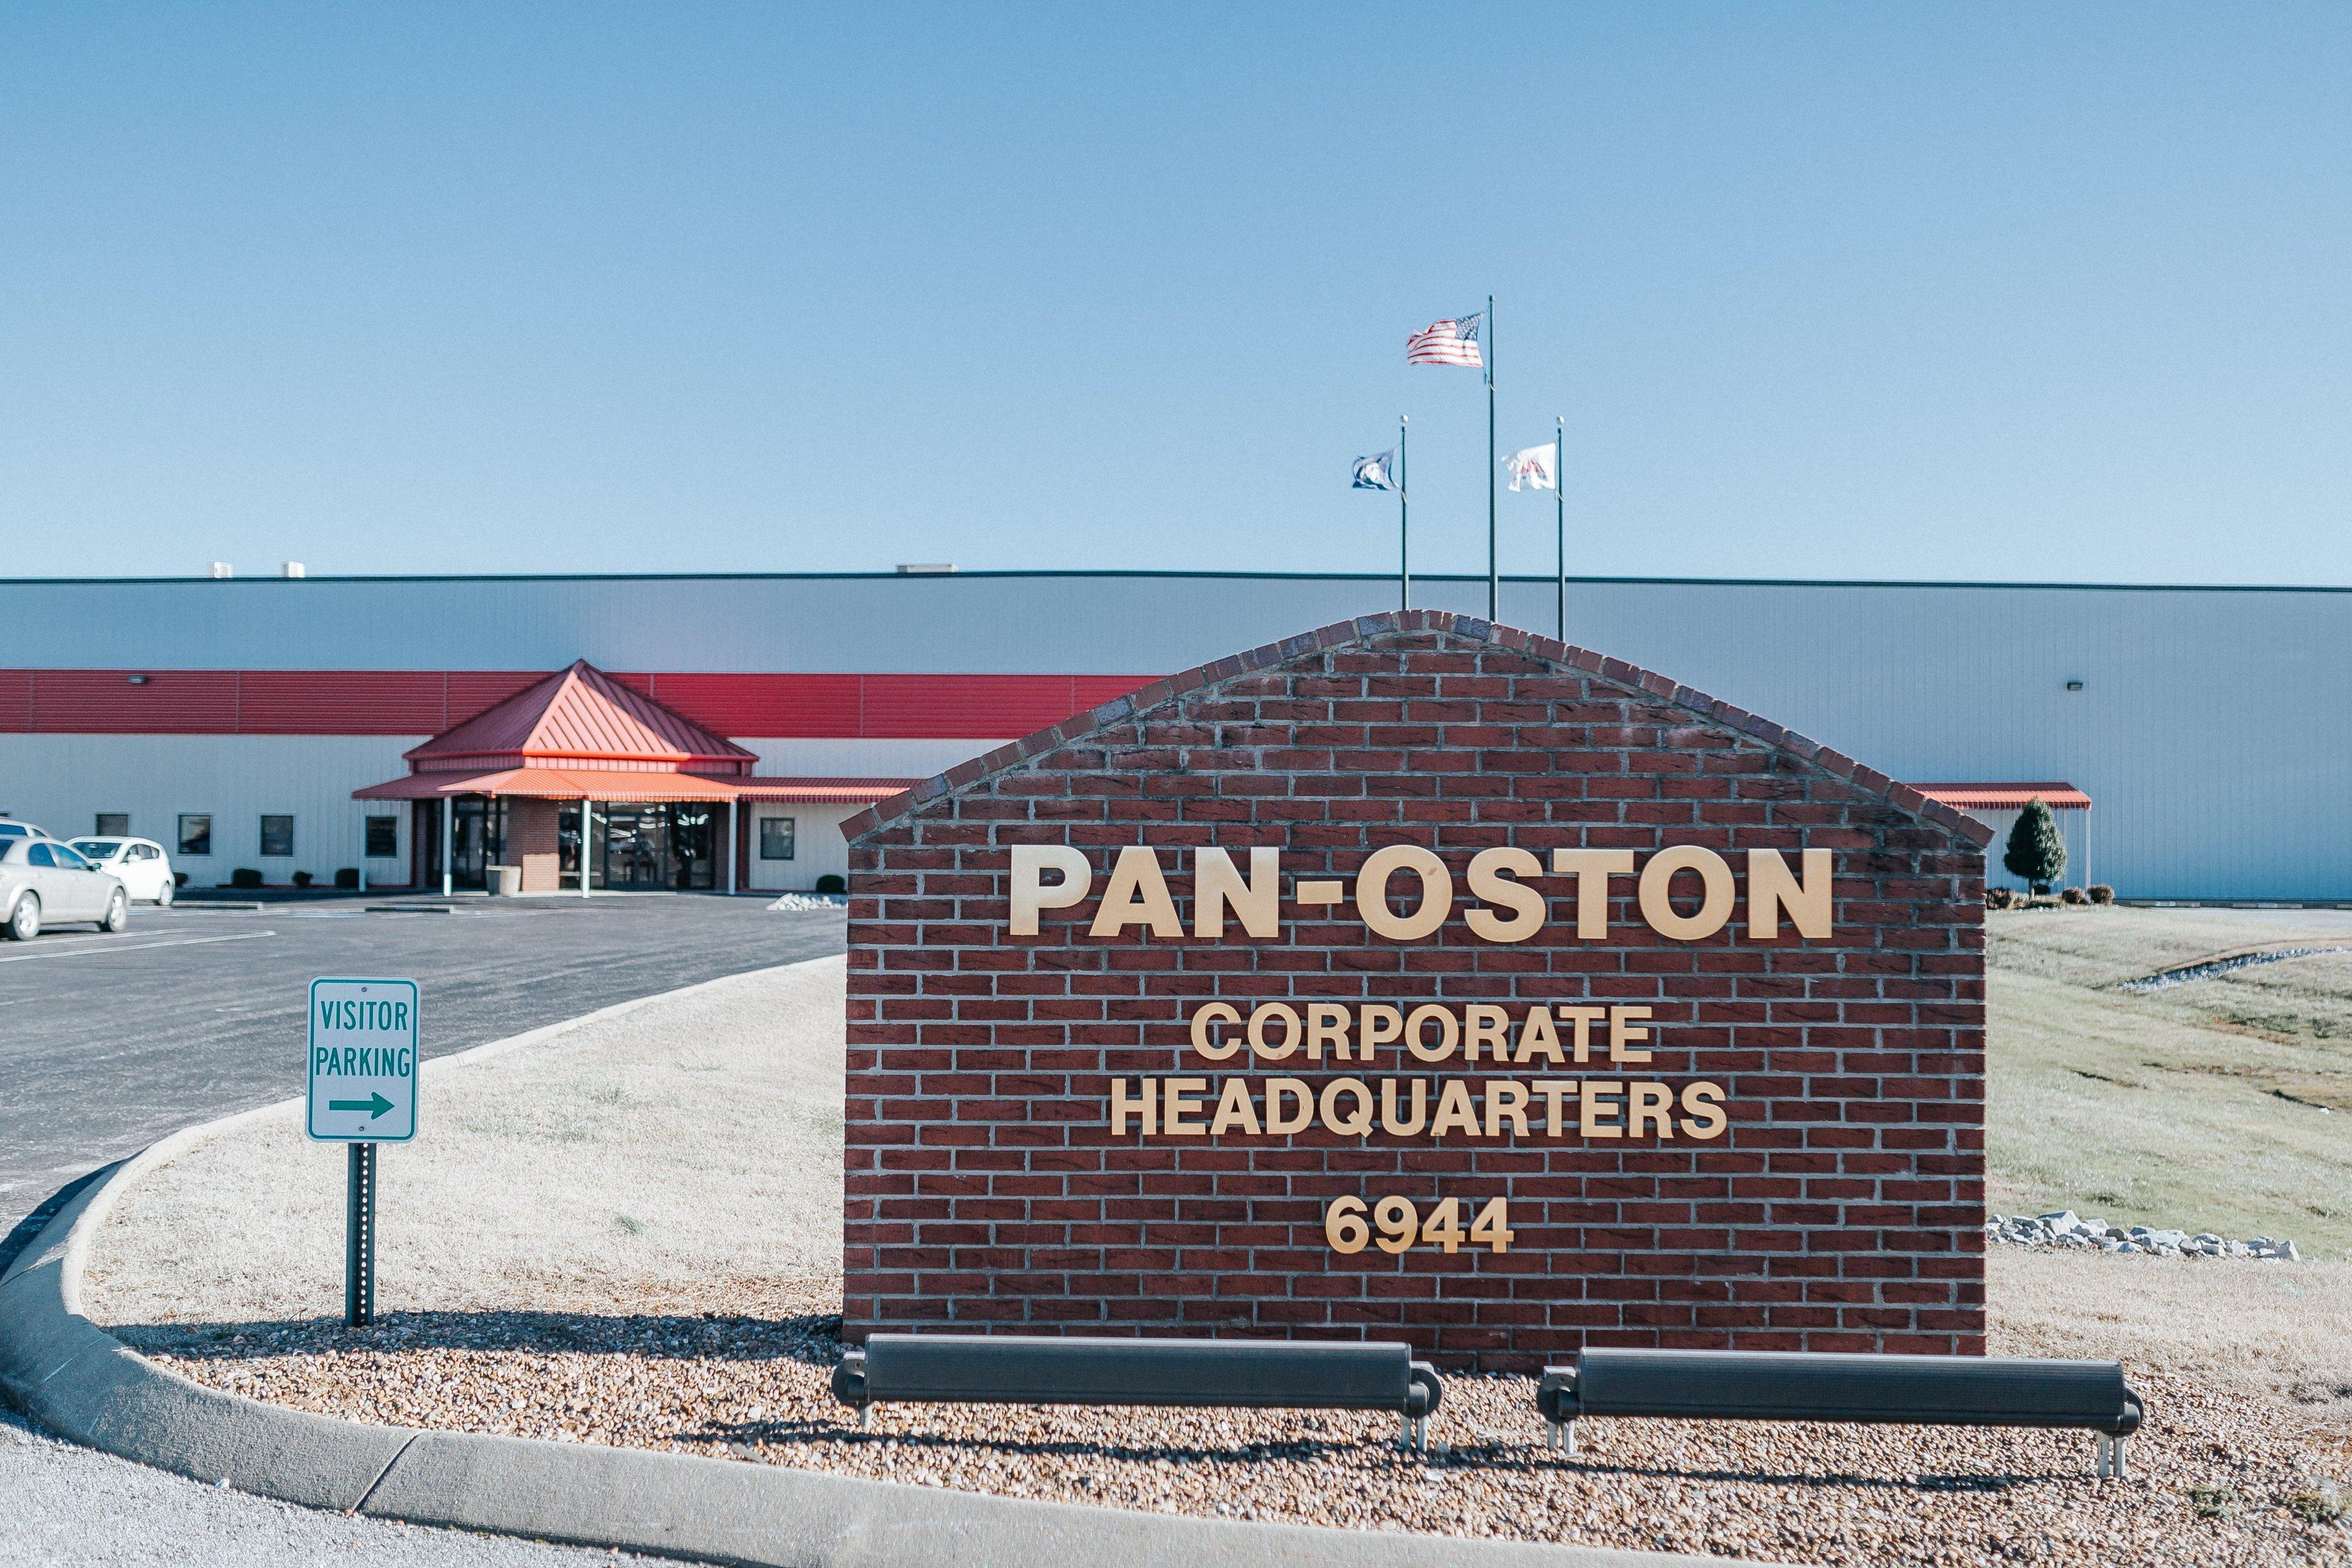 Pan-Oston Corporate Headquarters Sign.jpg